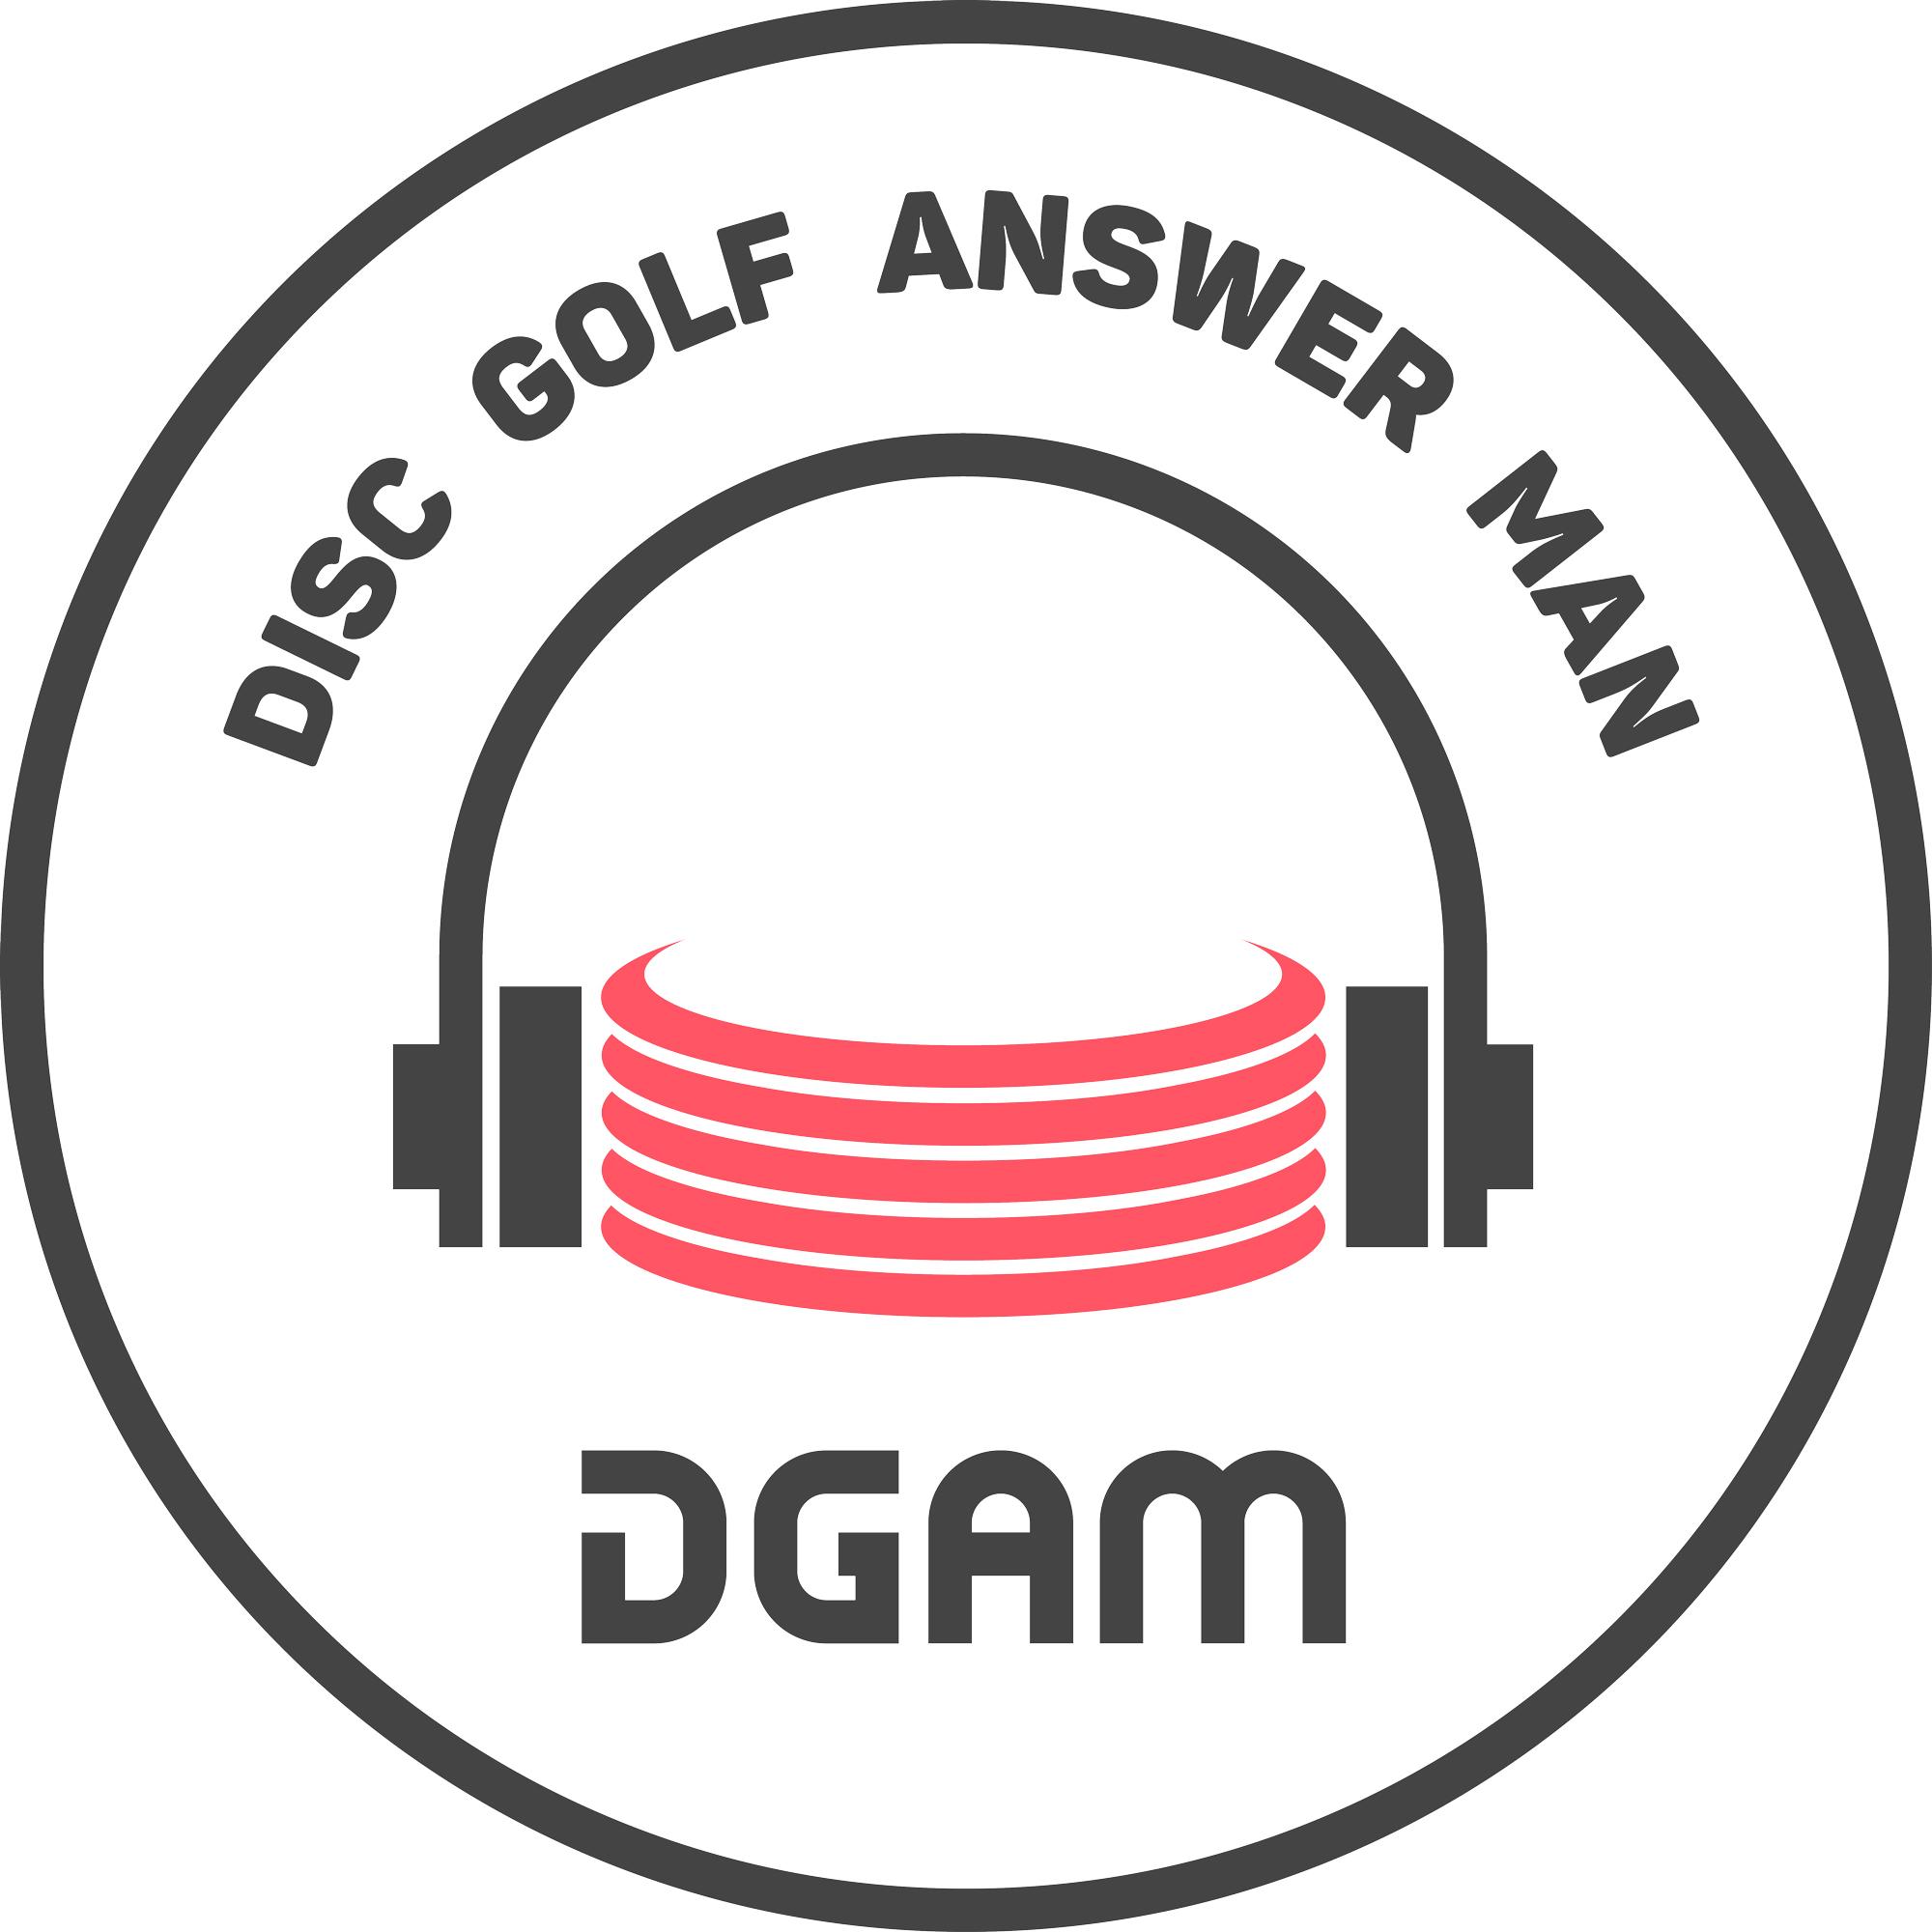 Ep 147 Disc Golf Answer Man